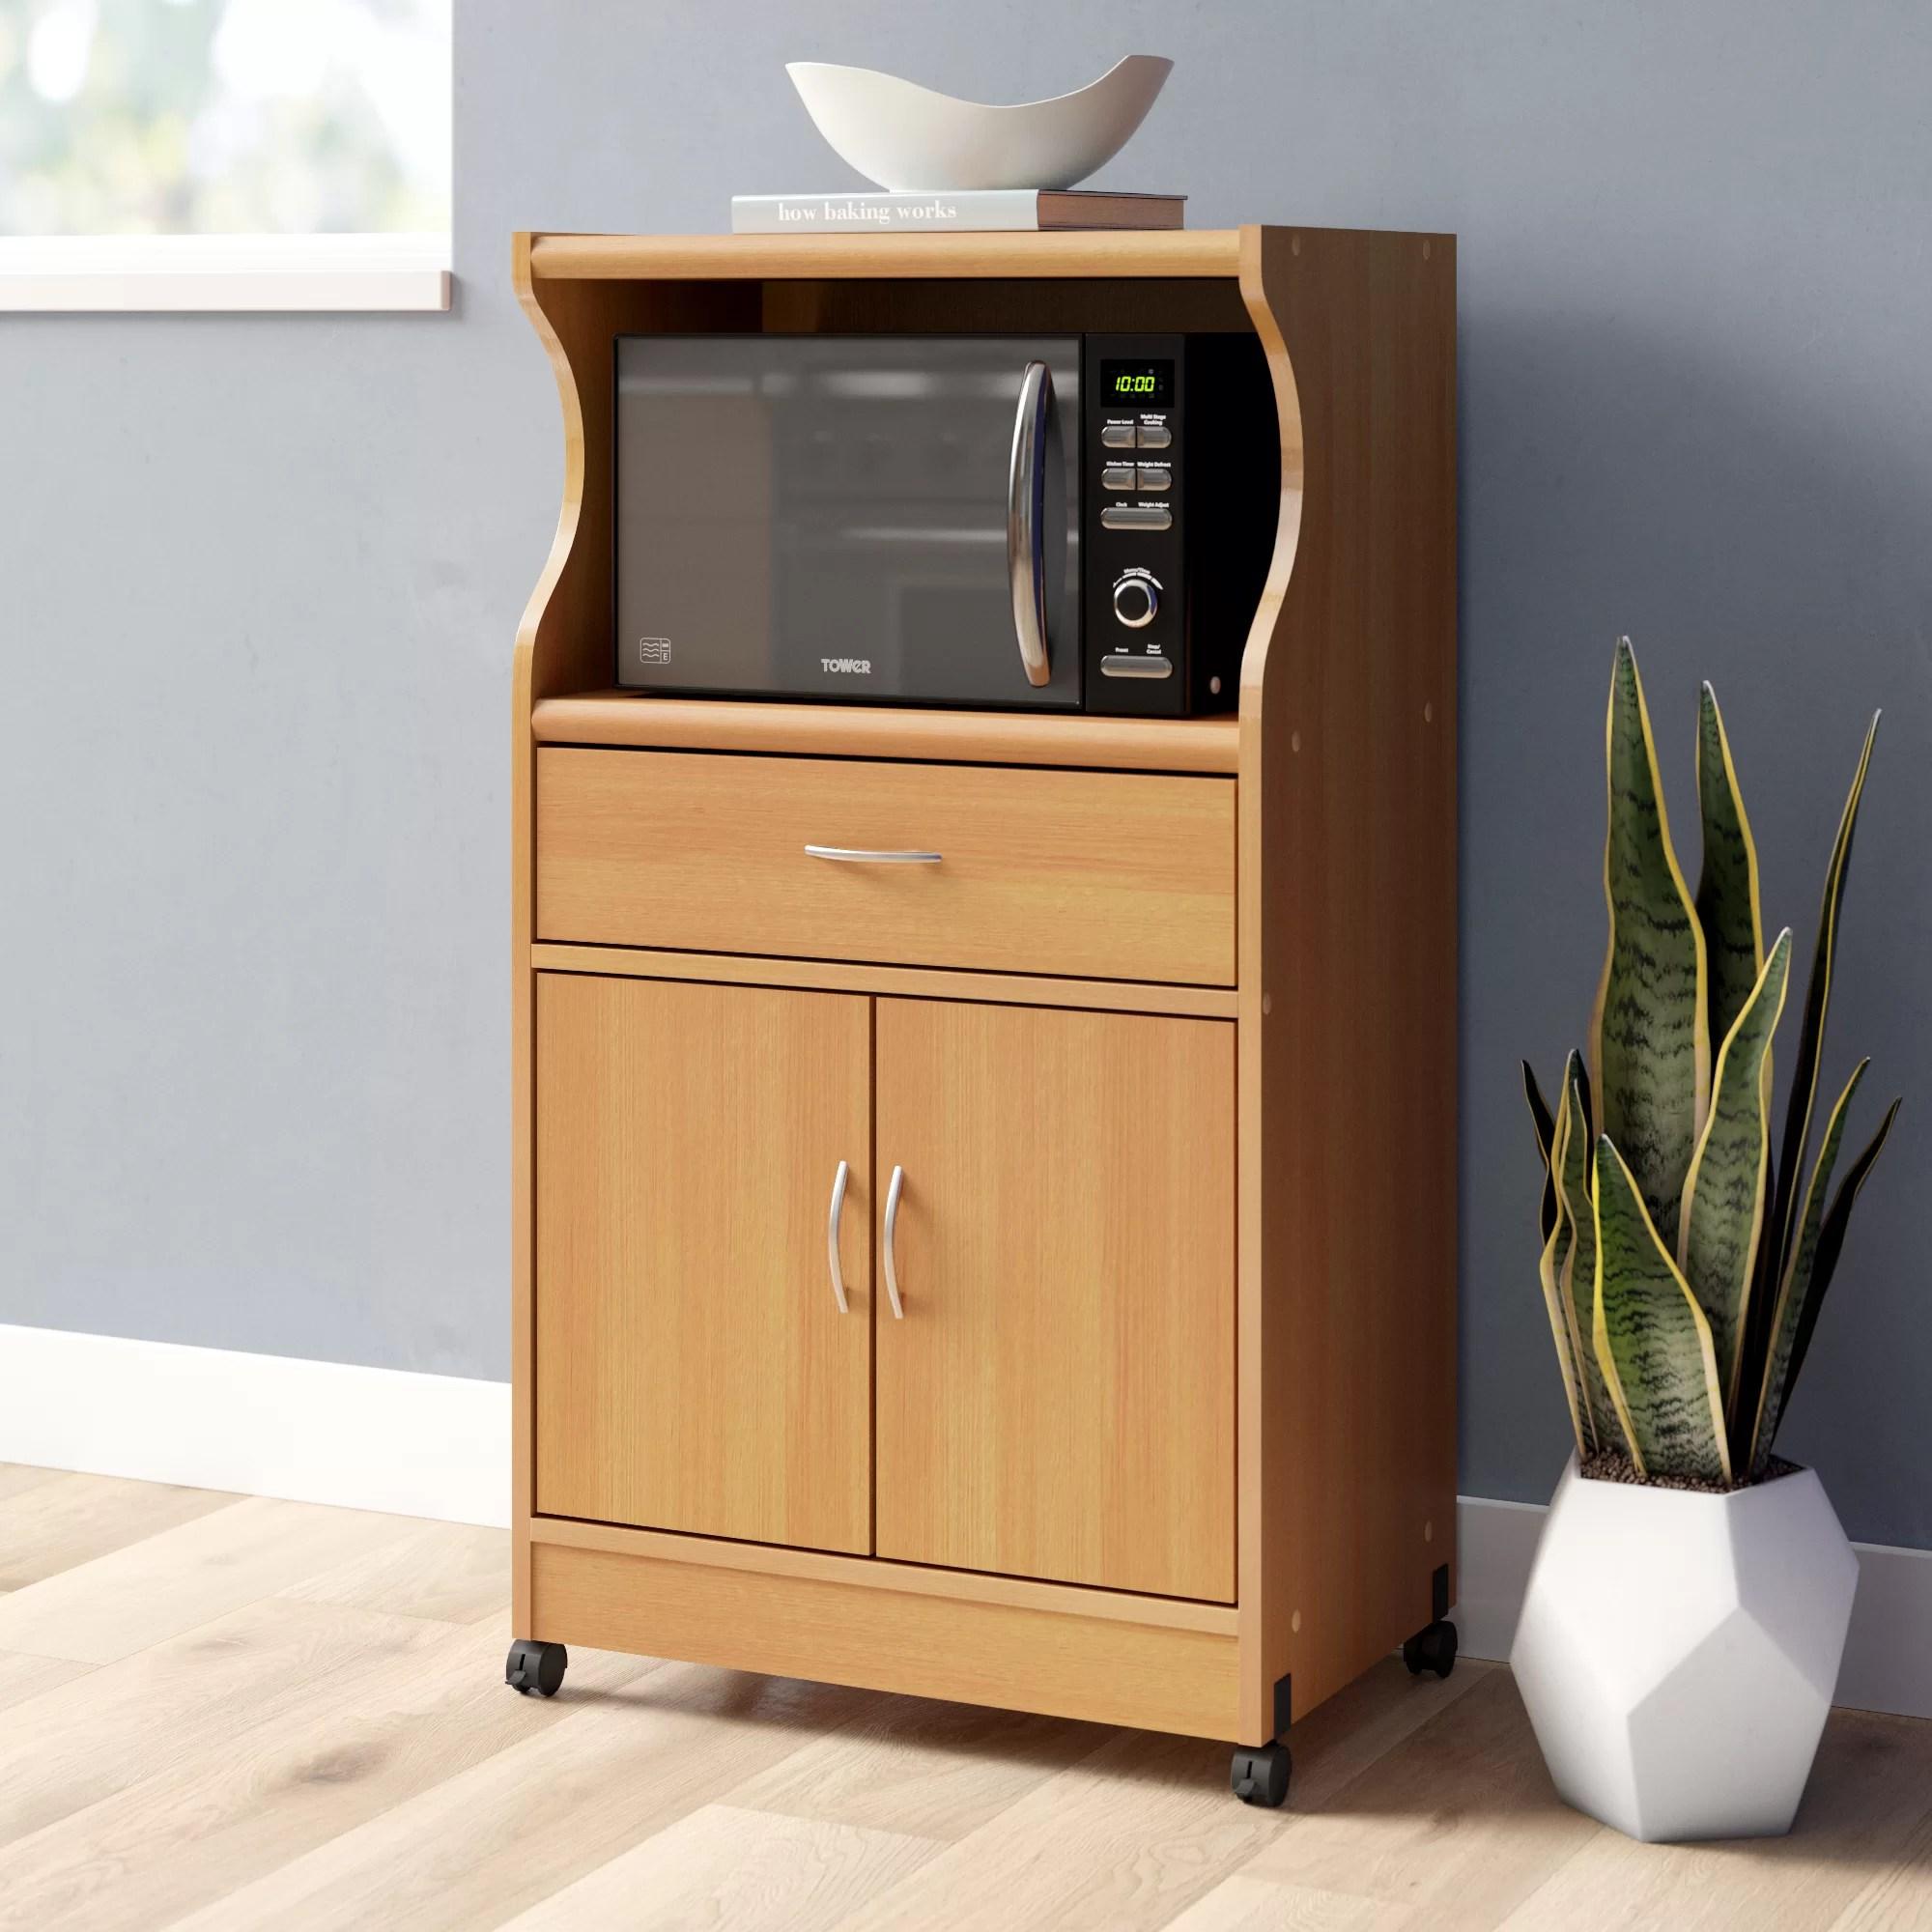 franchezca microwave kitchen cart